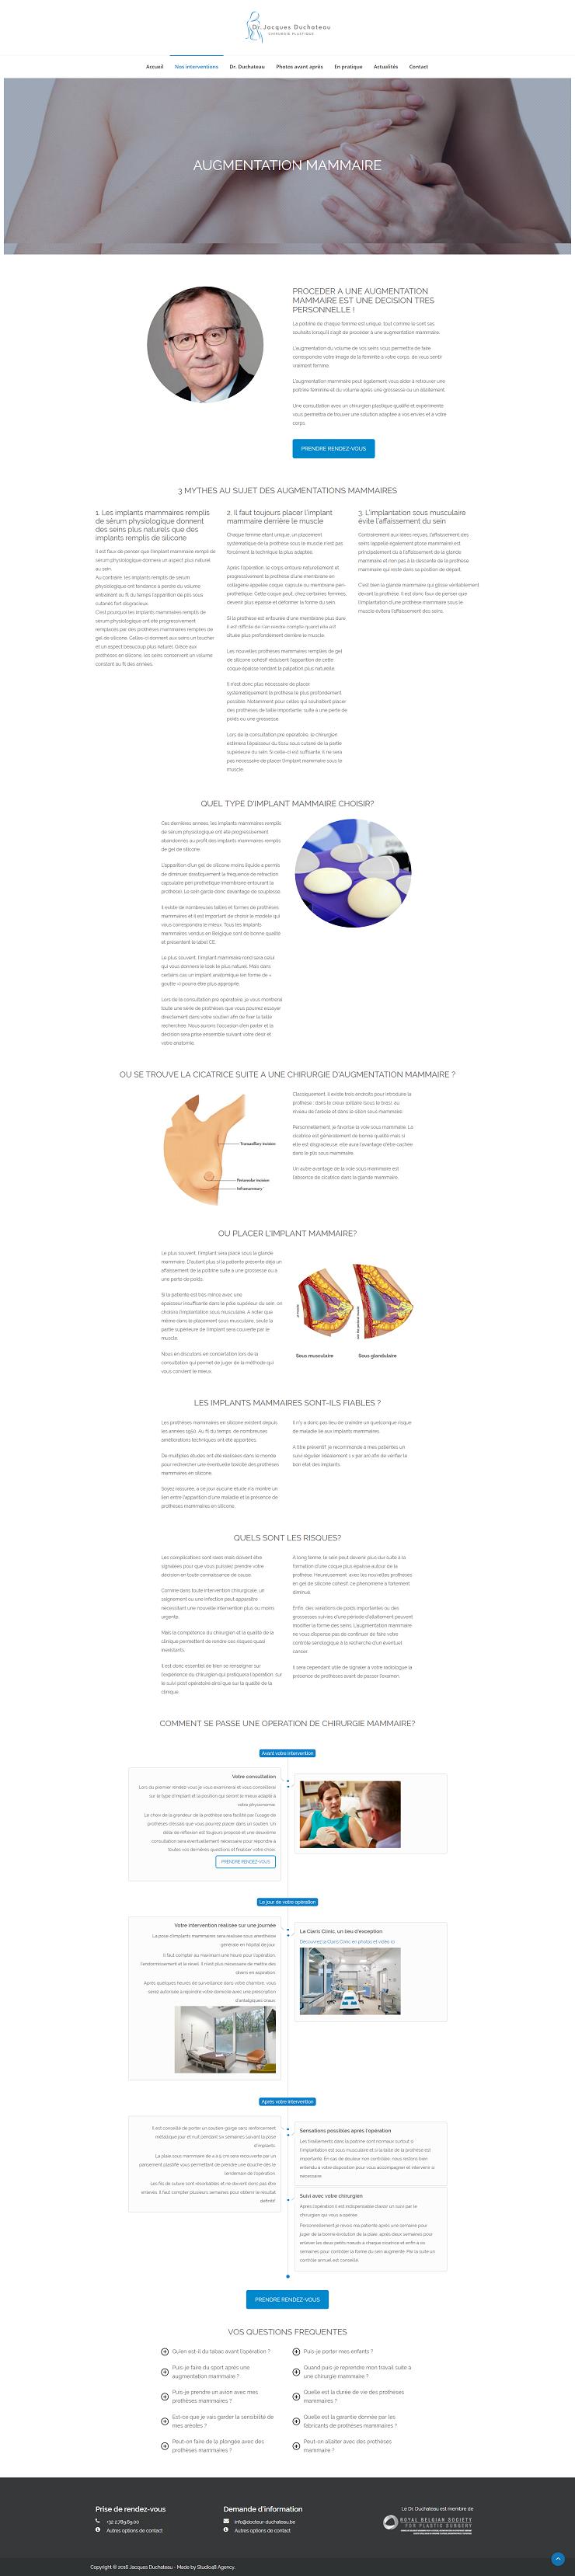 screenshot-docteur-duchateau.be-augmentation-mammaire